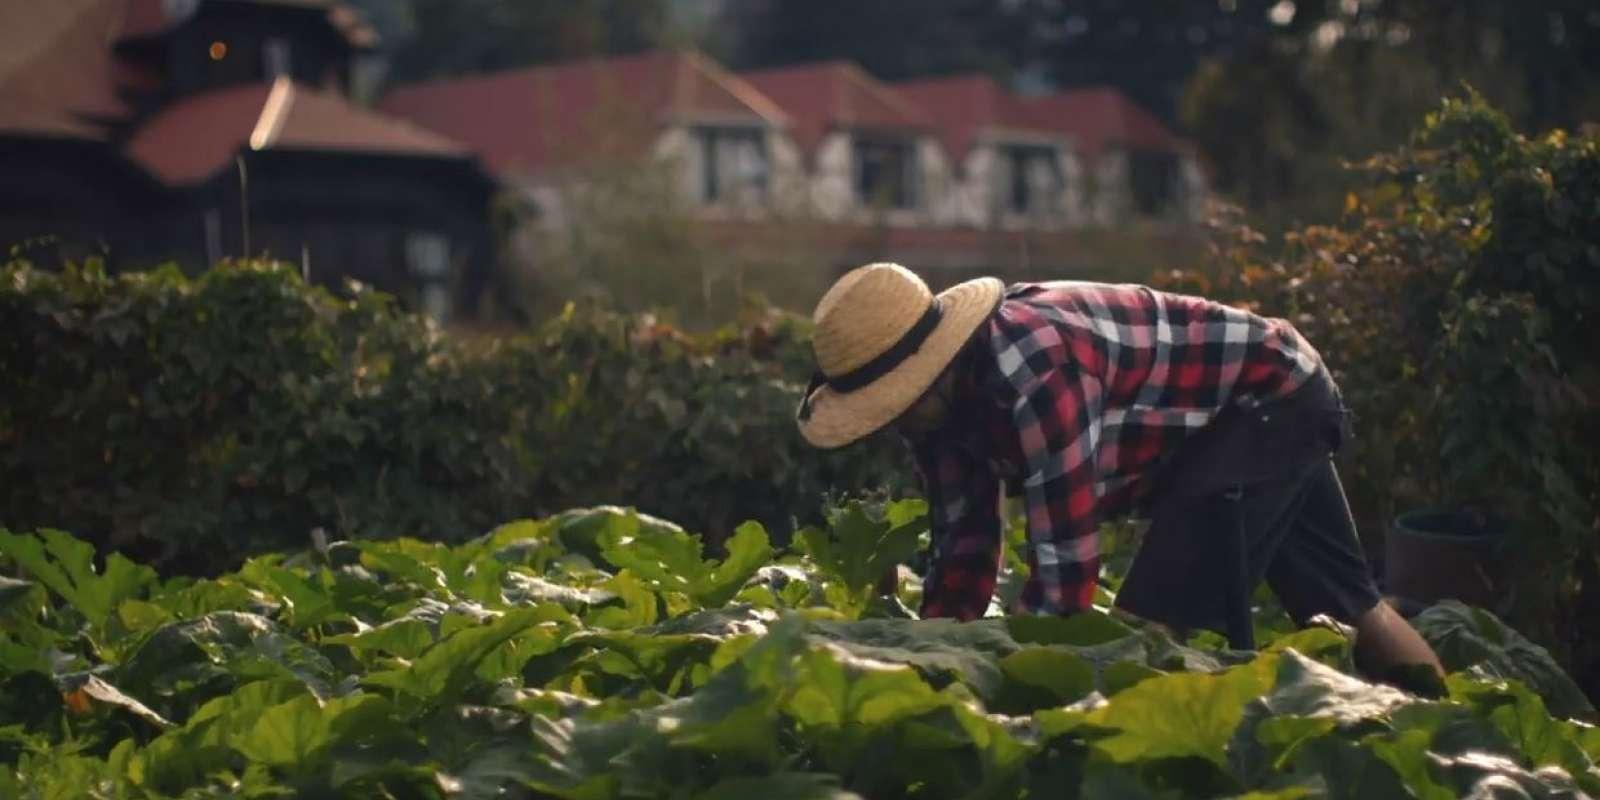 Sherwood vegetable garden